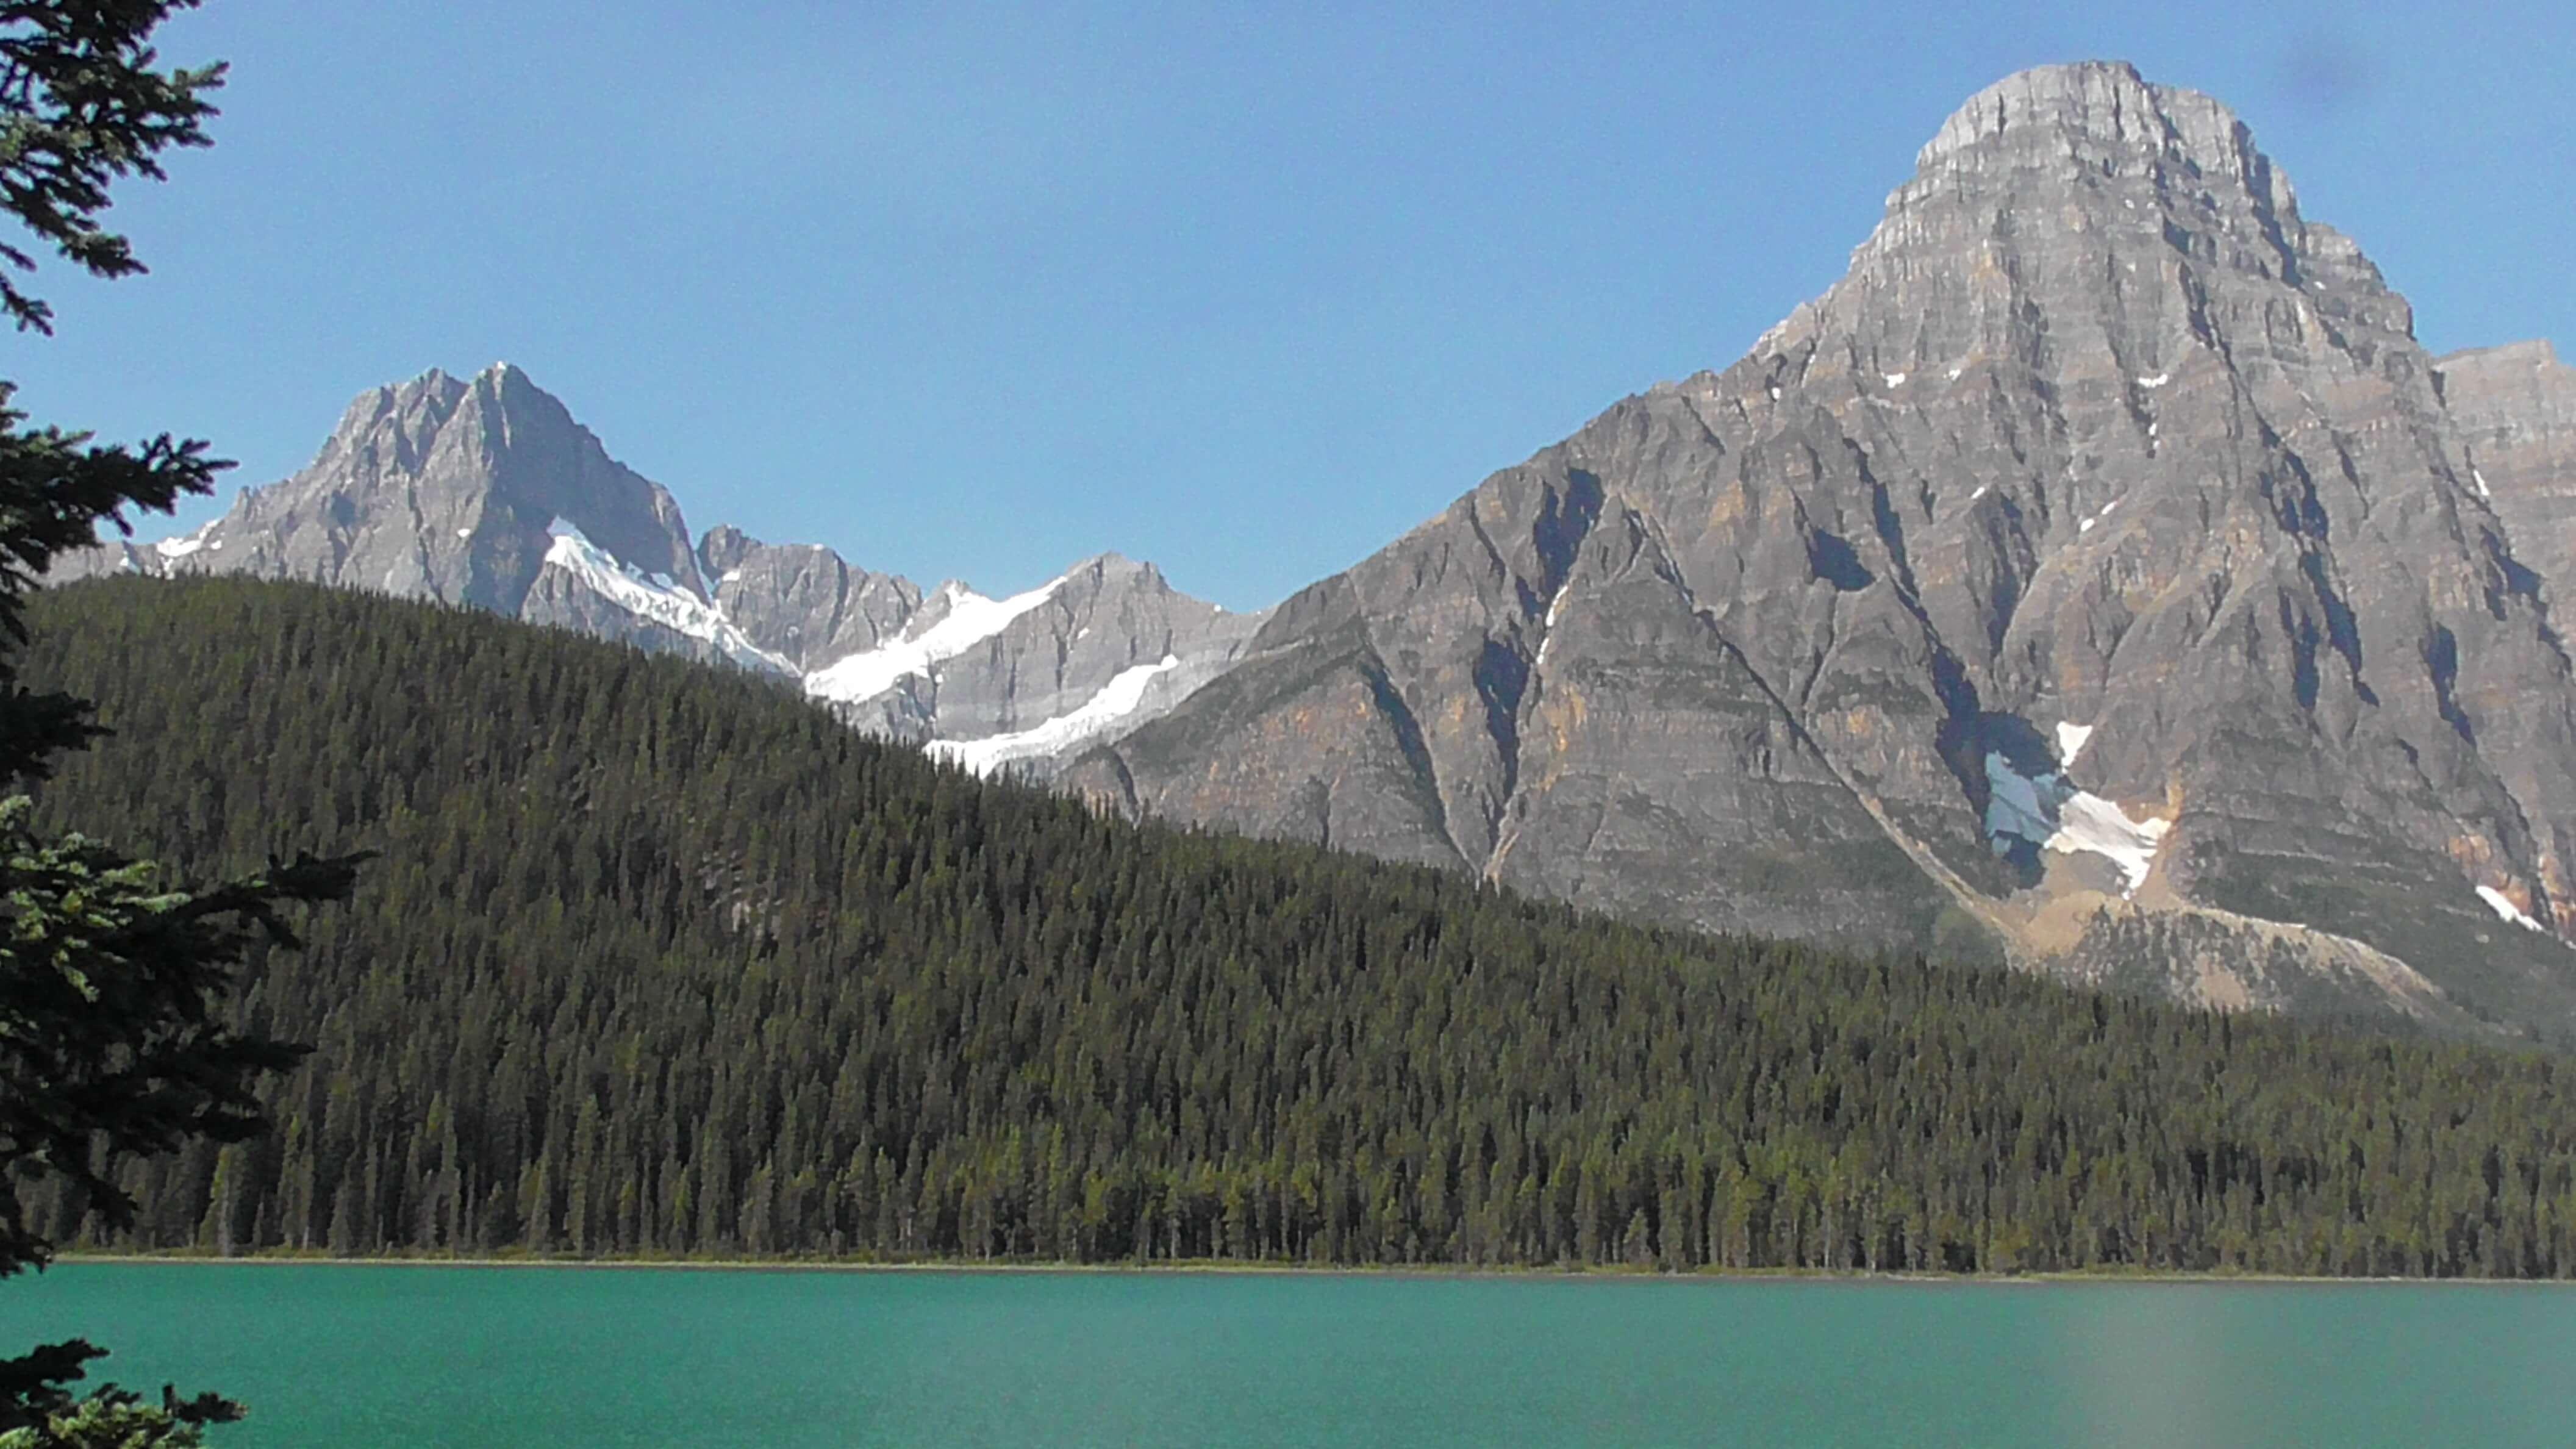 Mount Chephren, Lake Waterfowl, Banff National Park, Alberta